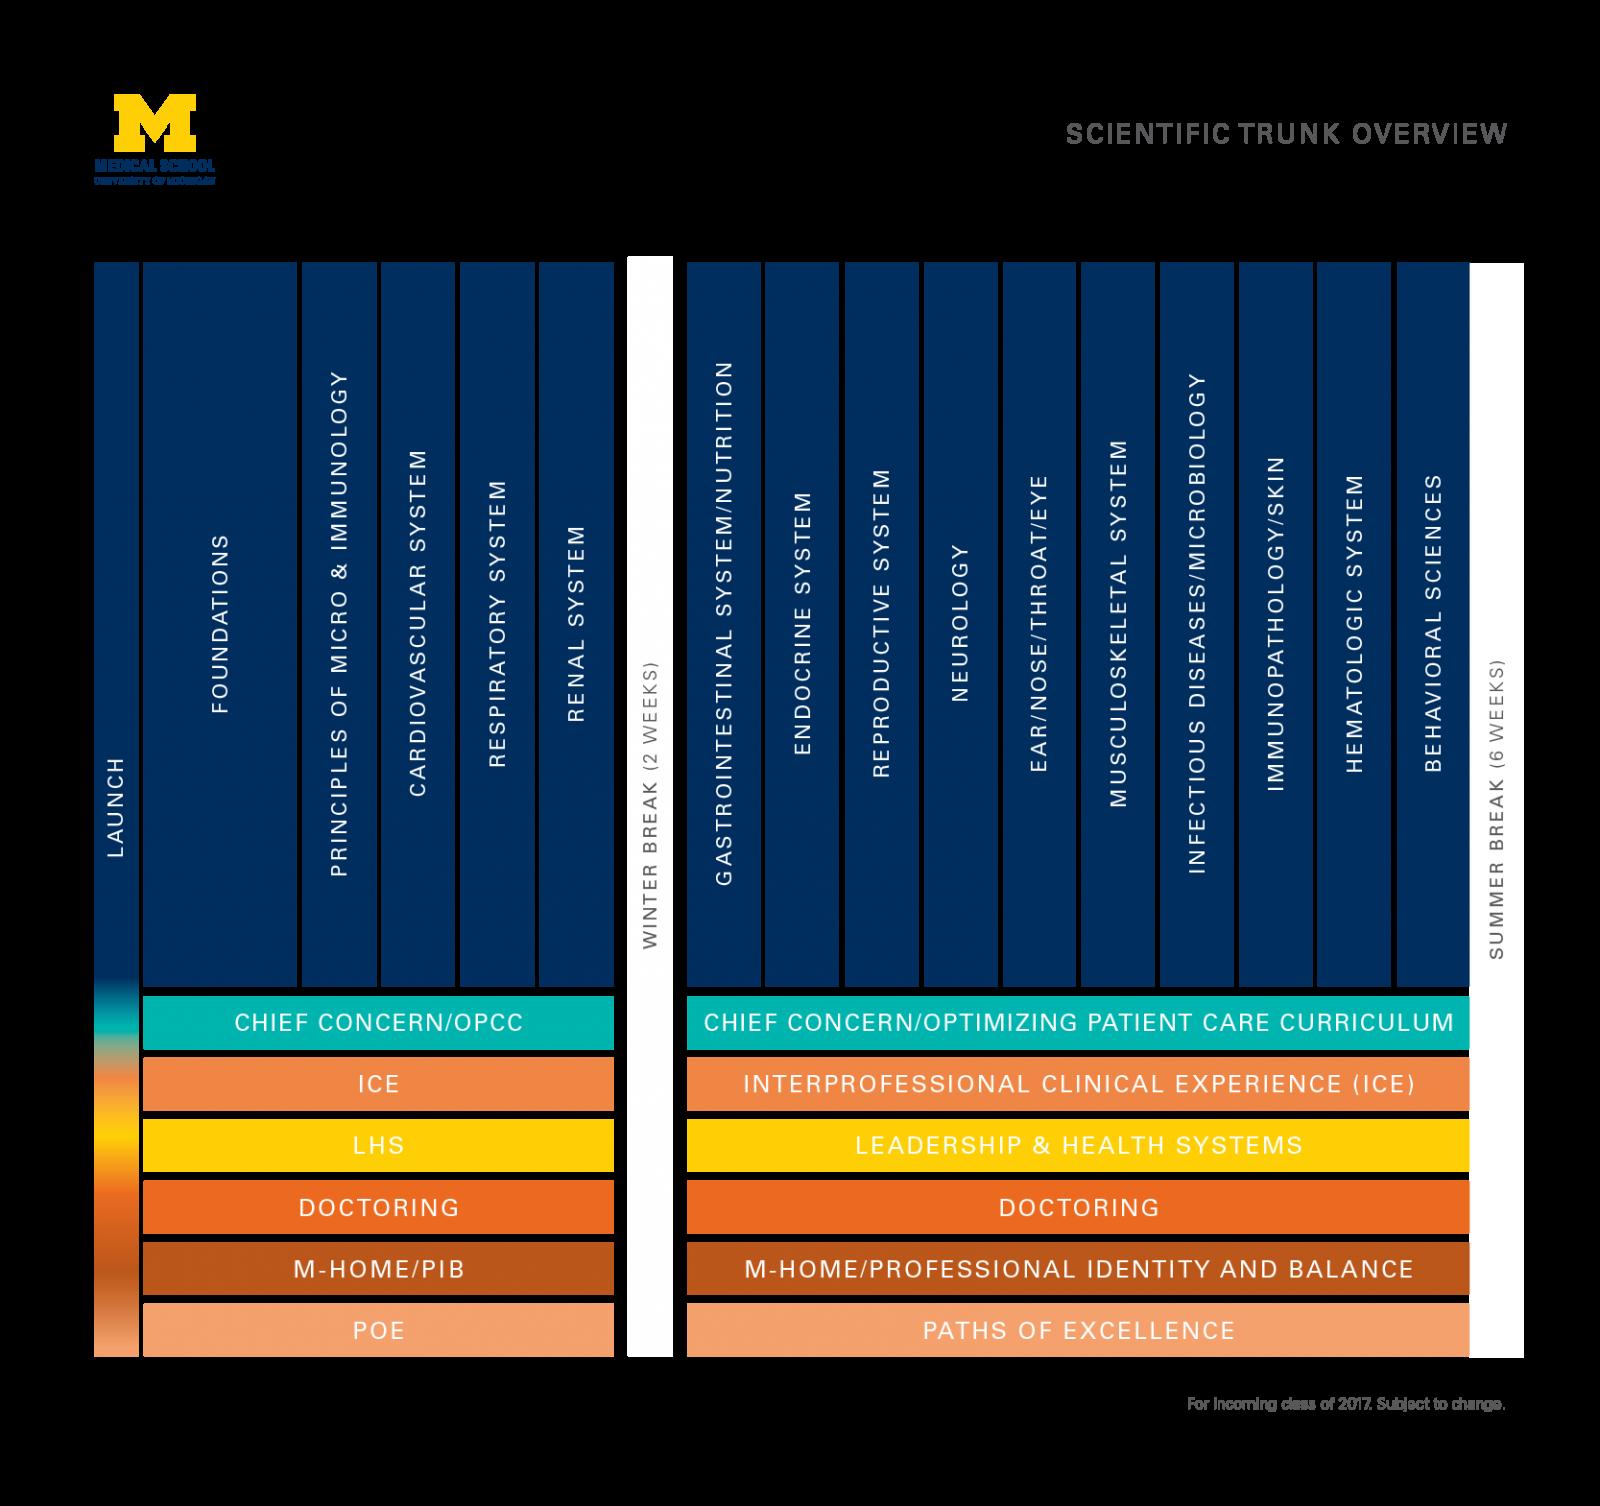 M.D. curriculum scientific trunk overview infographic